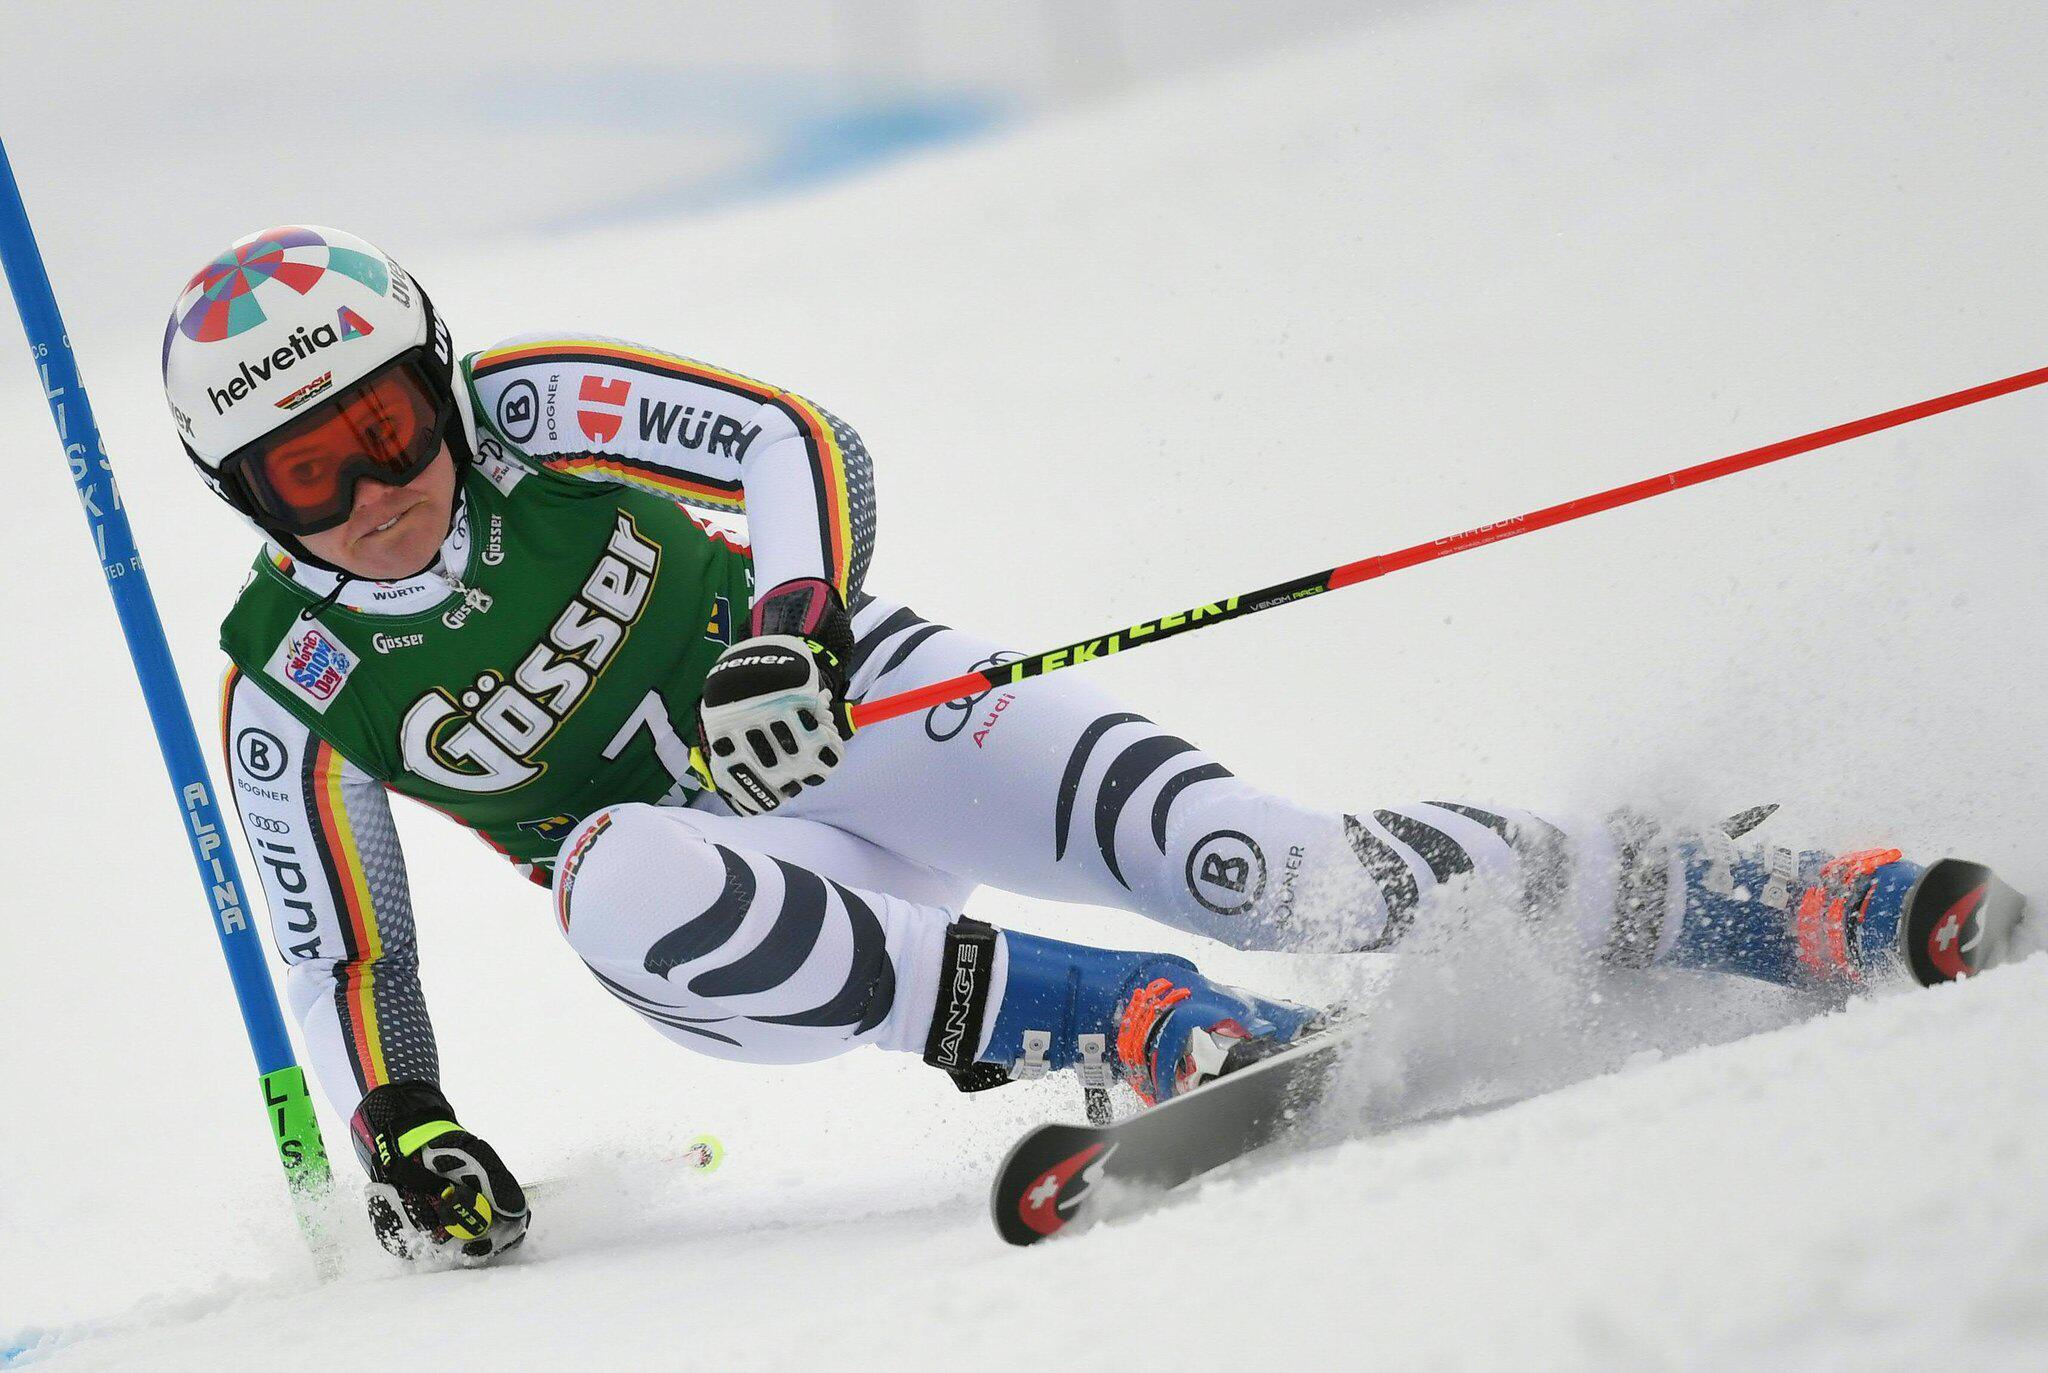 Bild zu Ski alpin, Weltcup, Riesenslalom, Semmering, Viktoria Rebensburg